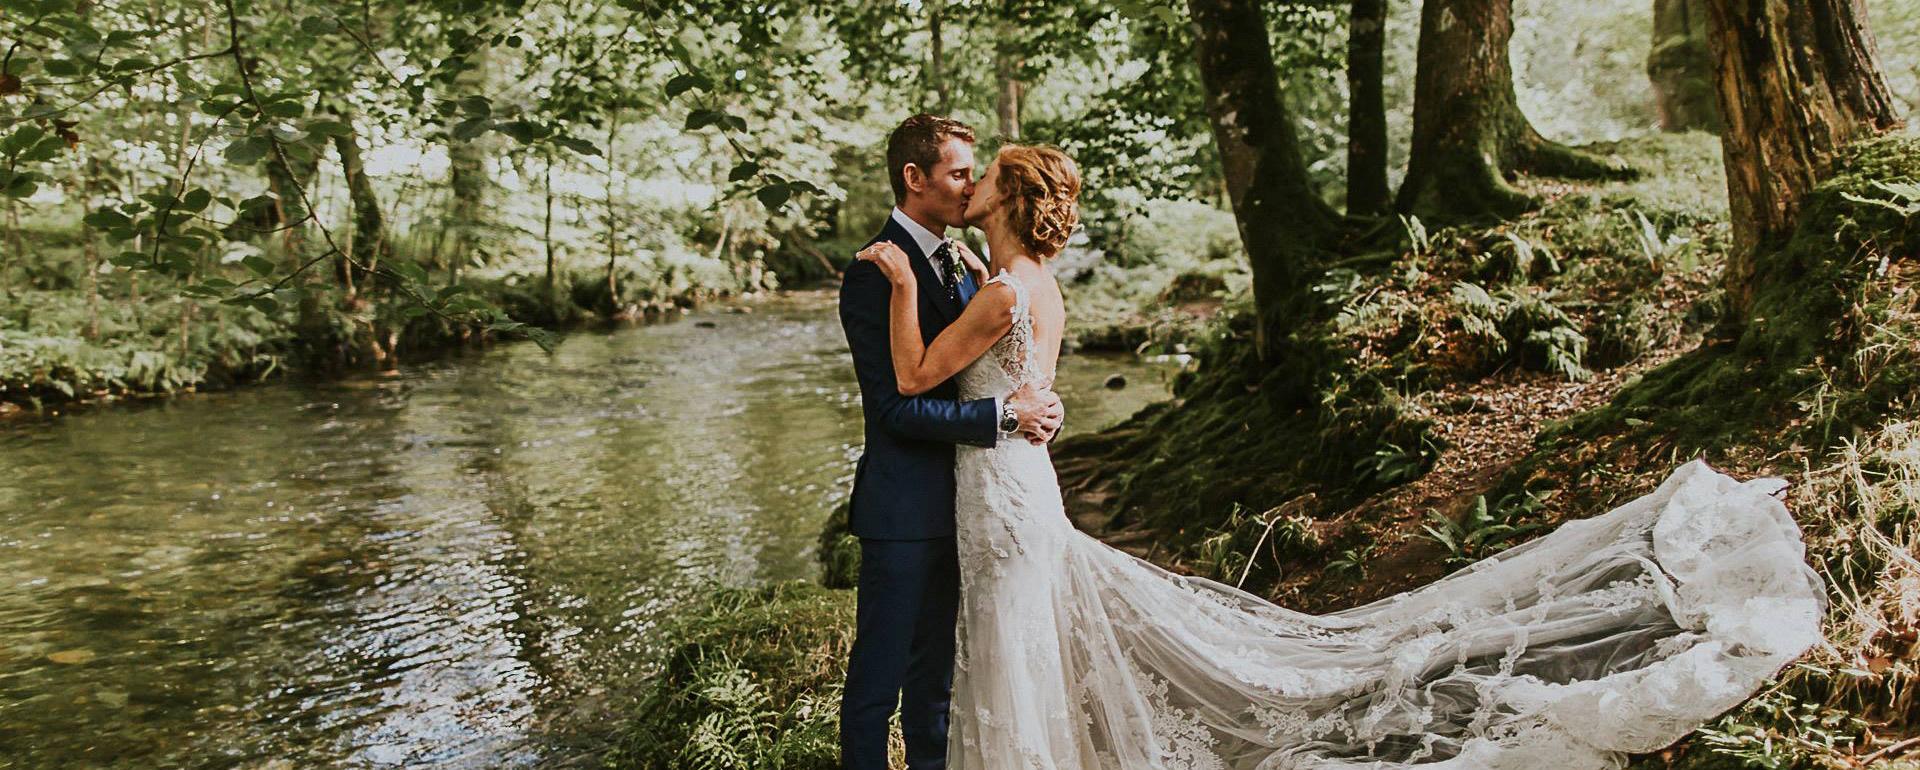 Ever After – A Dartmoor Wedding